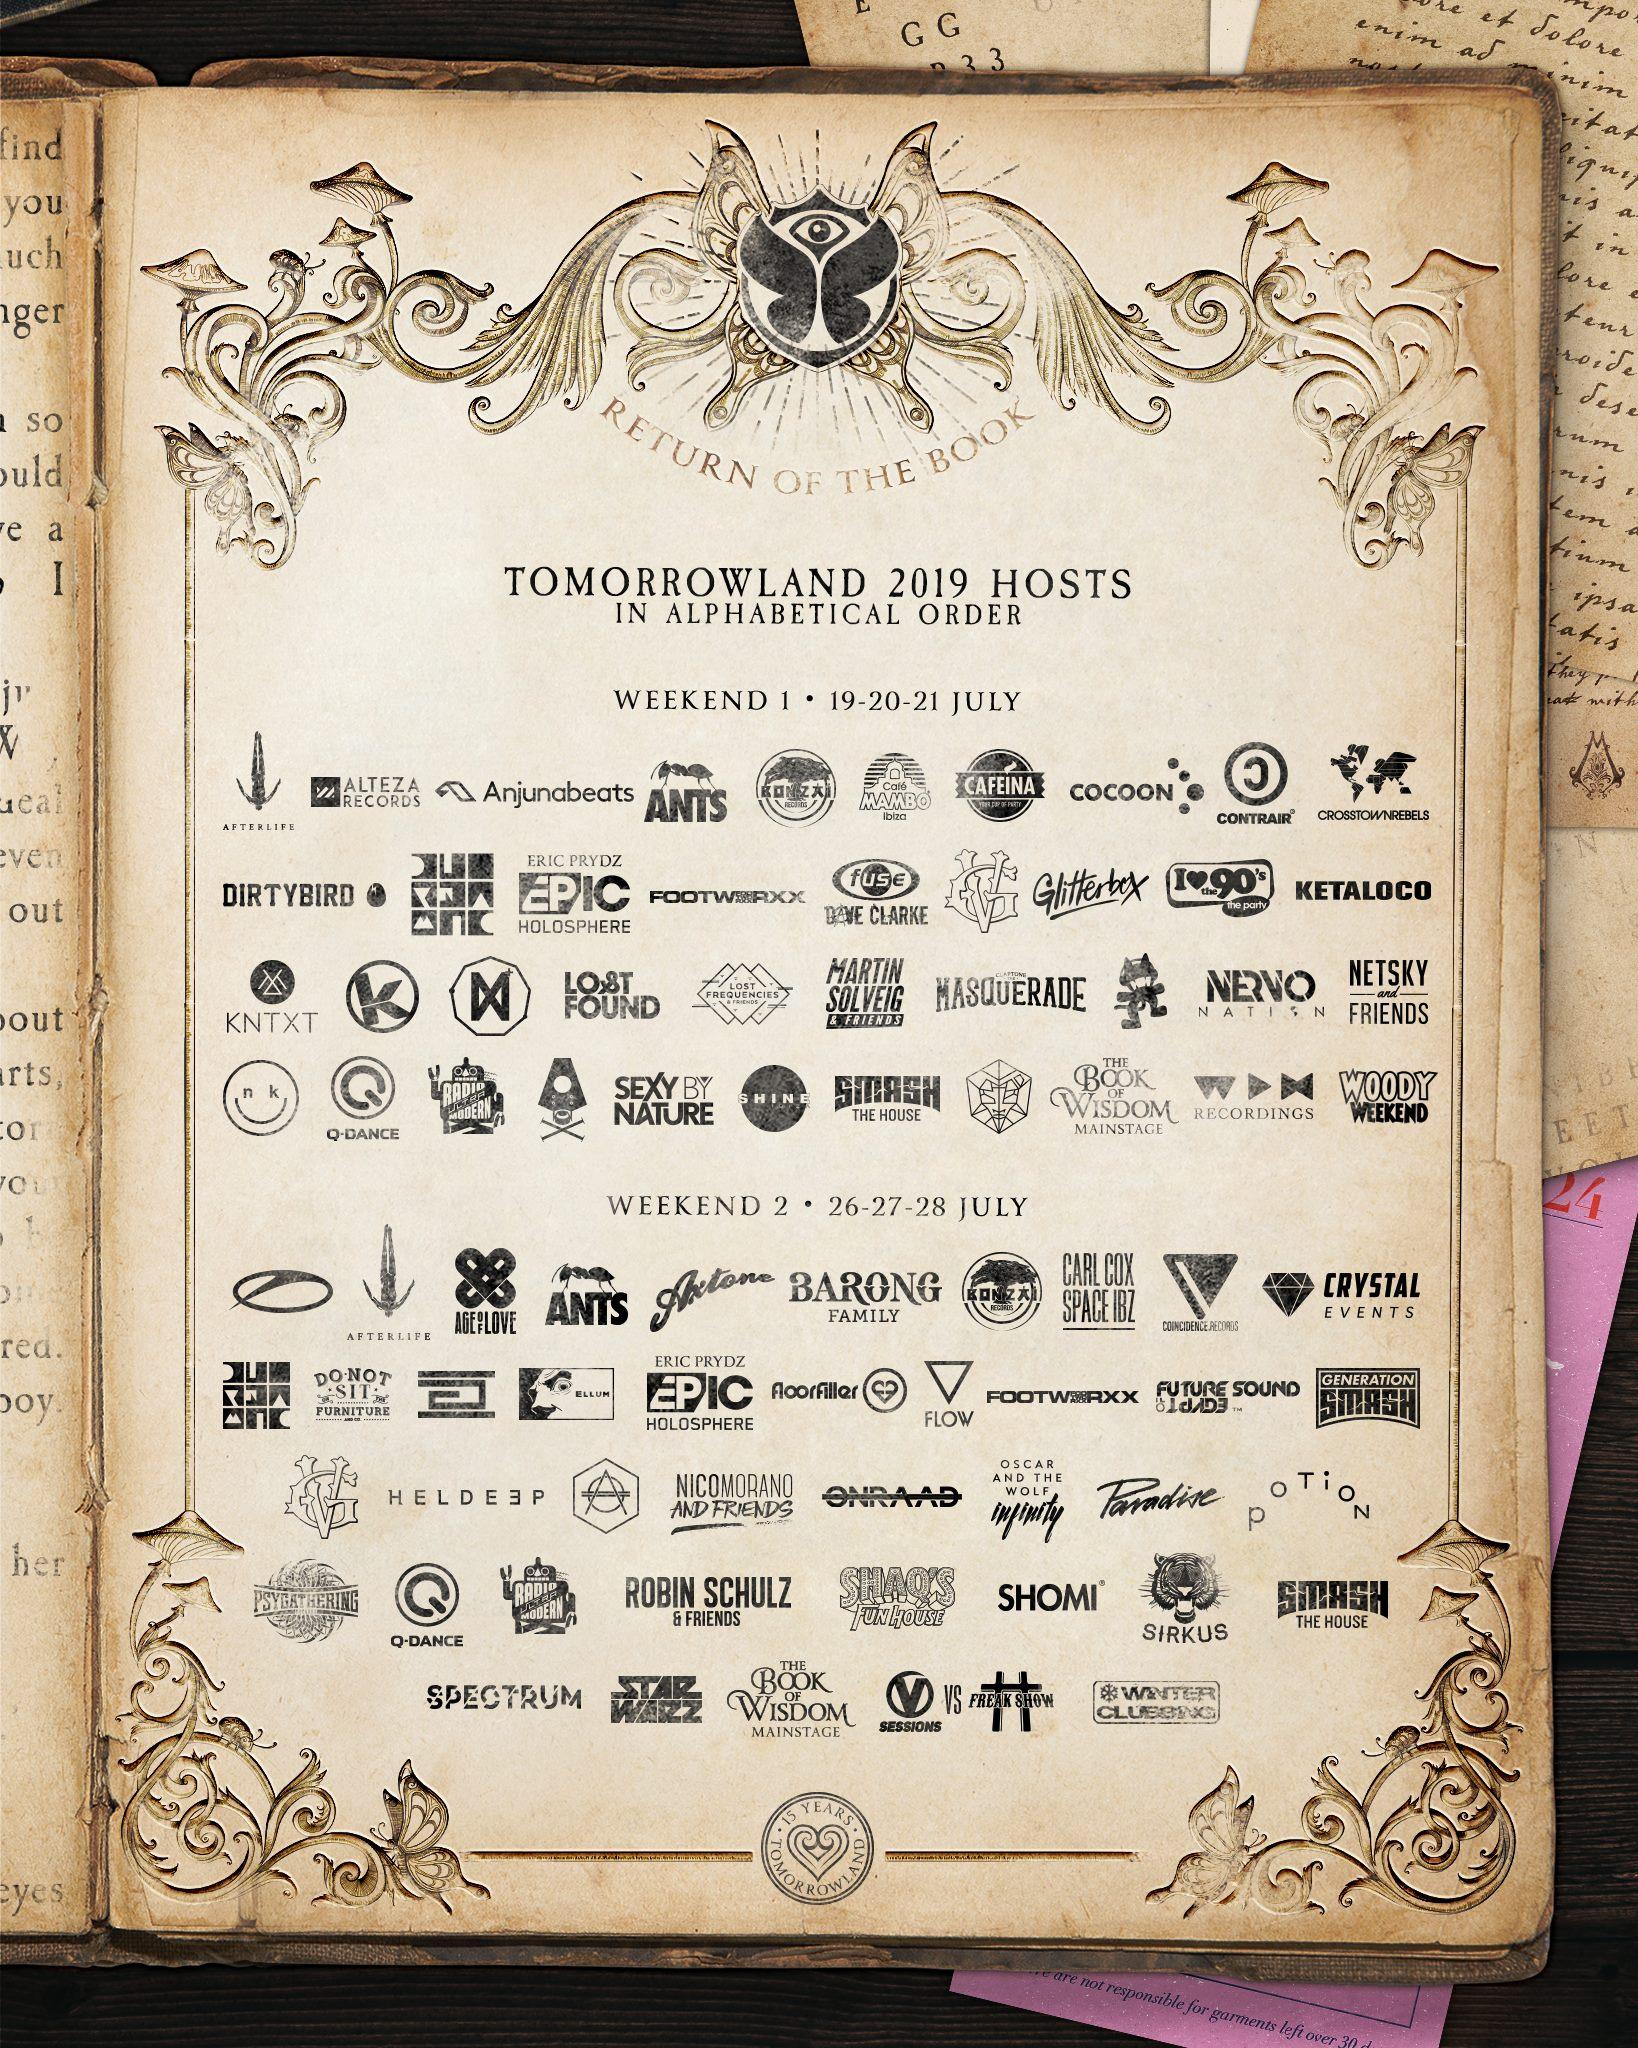 Tomorrowland 2019 Stage Hosts